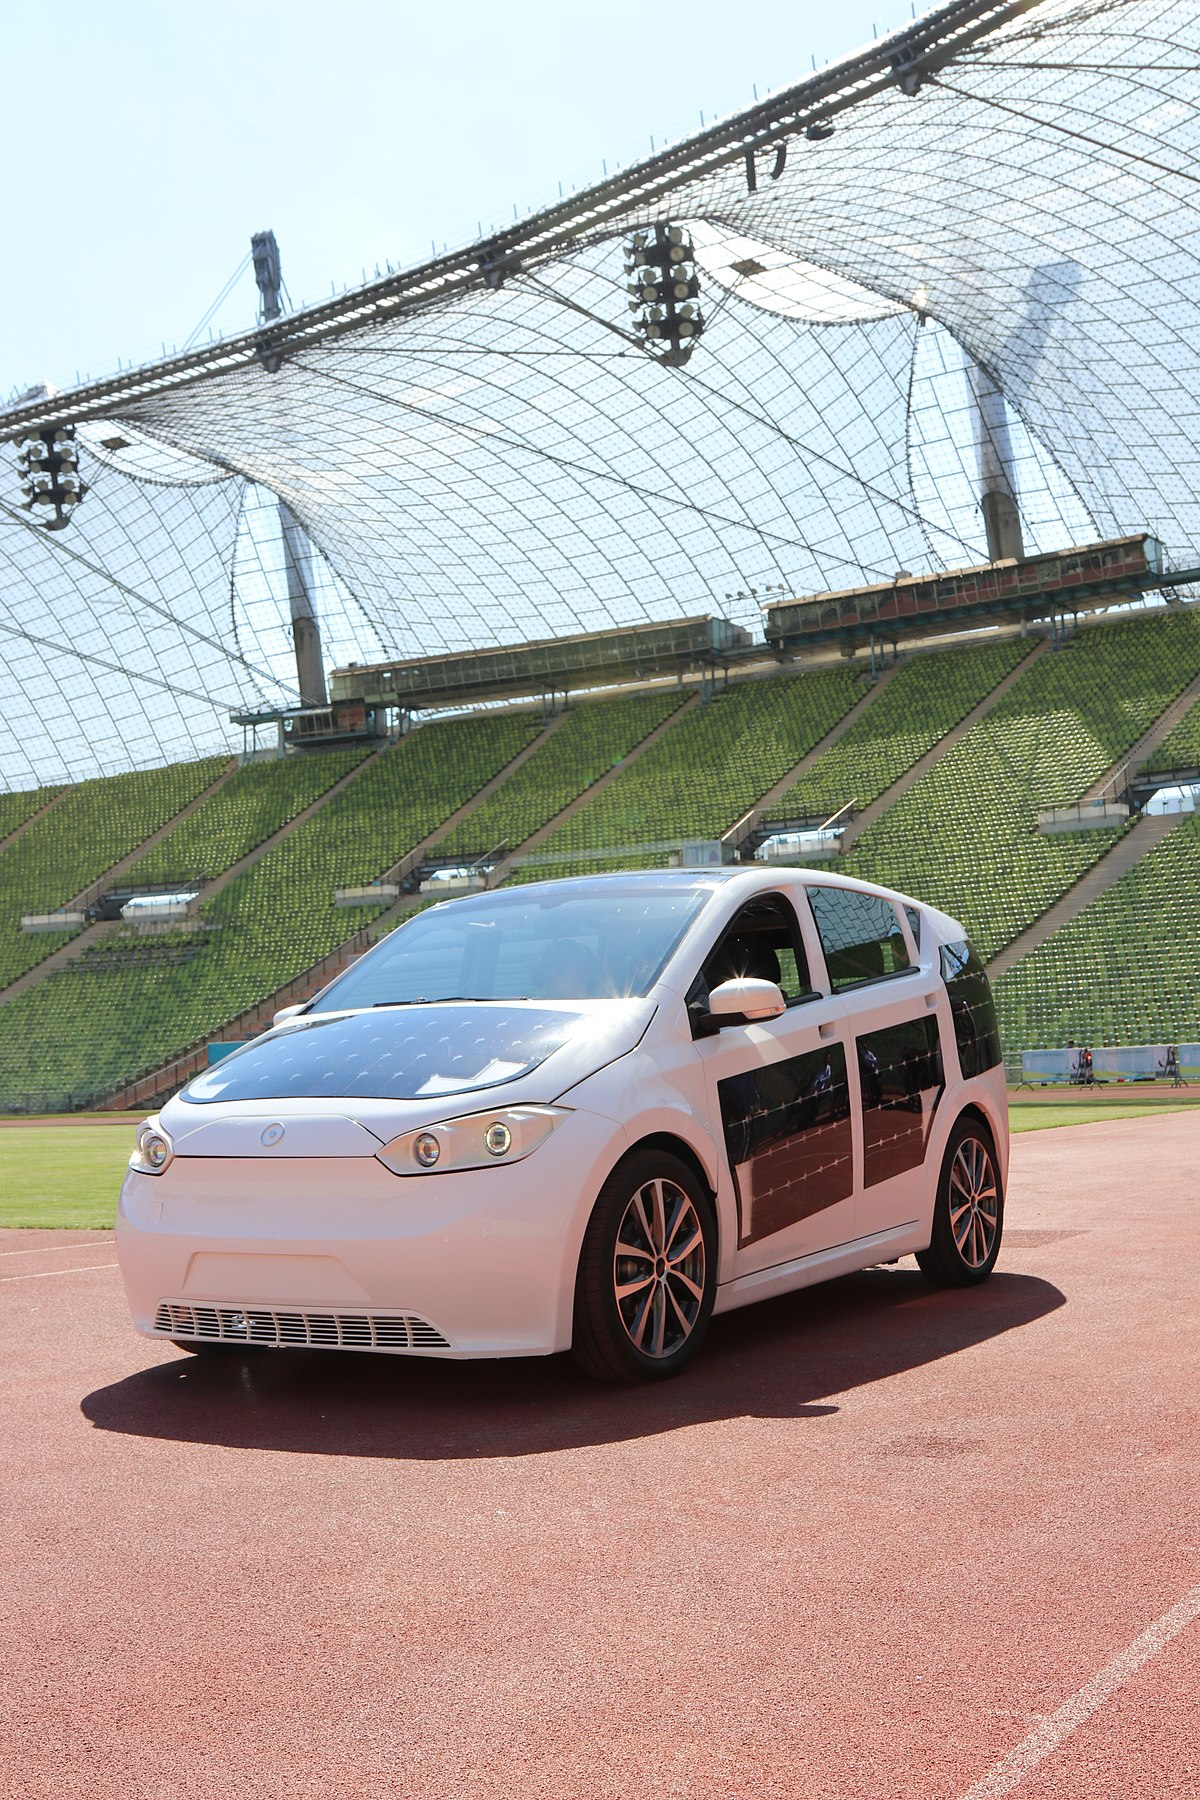 Sion (automóvil) - Wikipedia, la enciclopedia libre